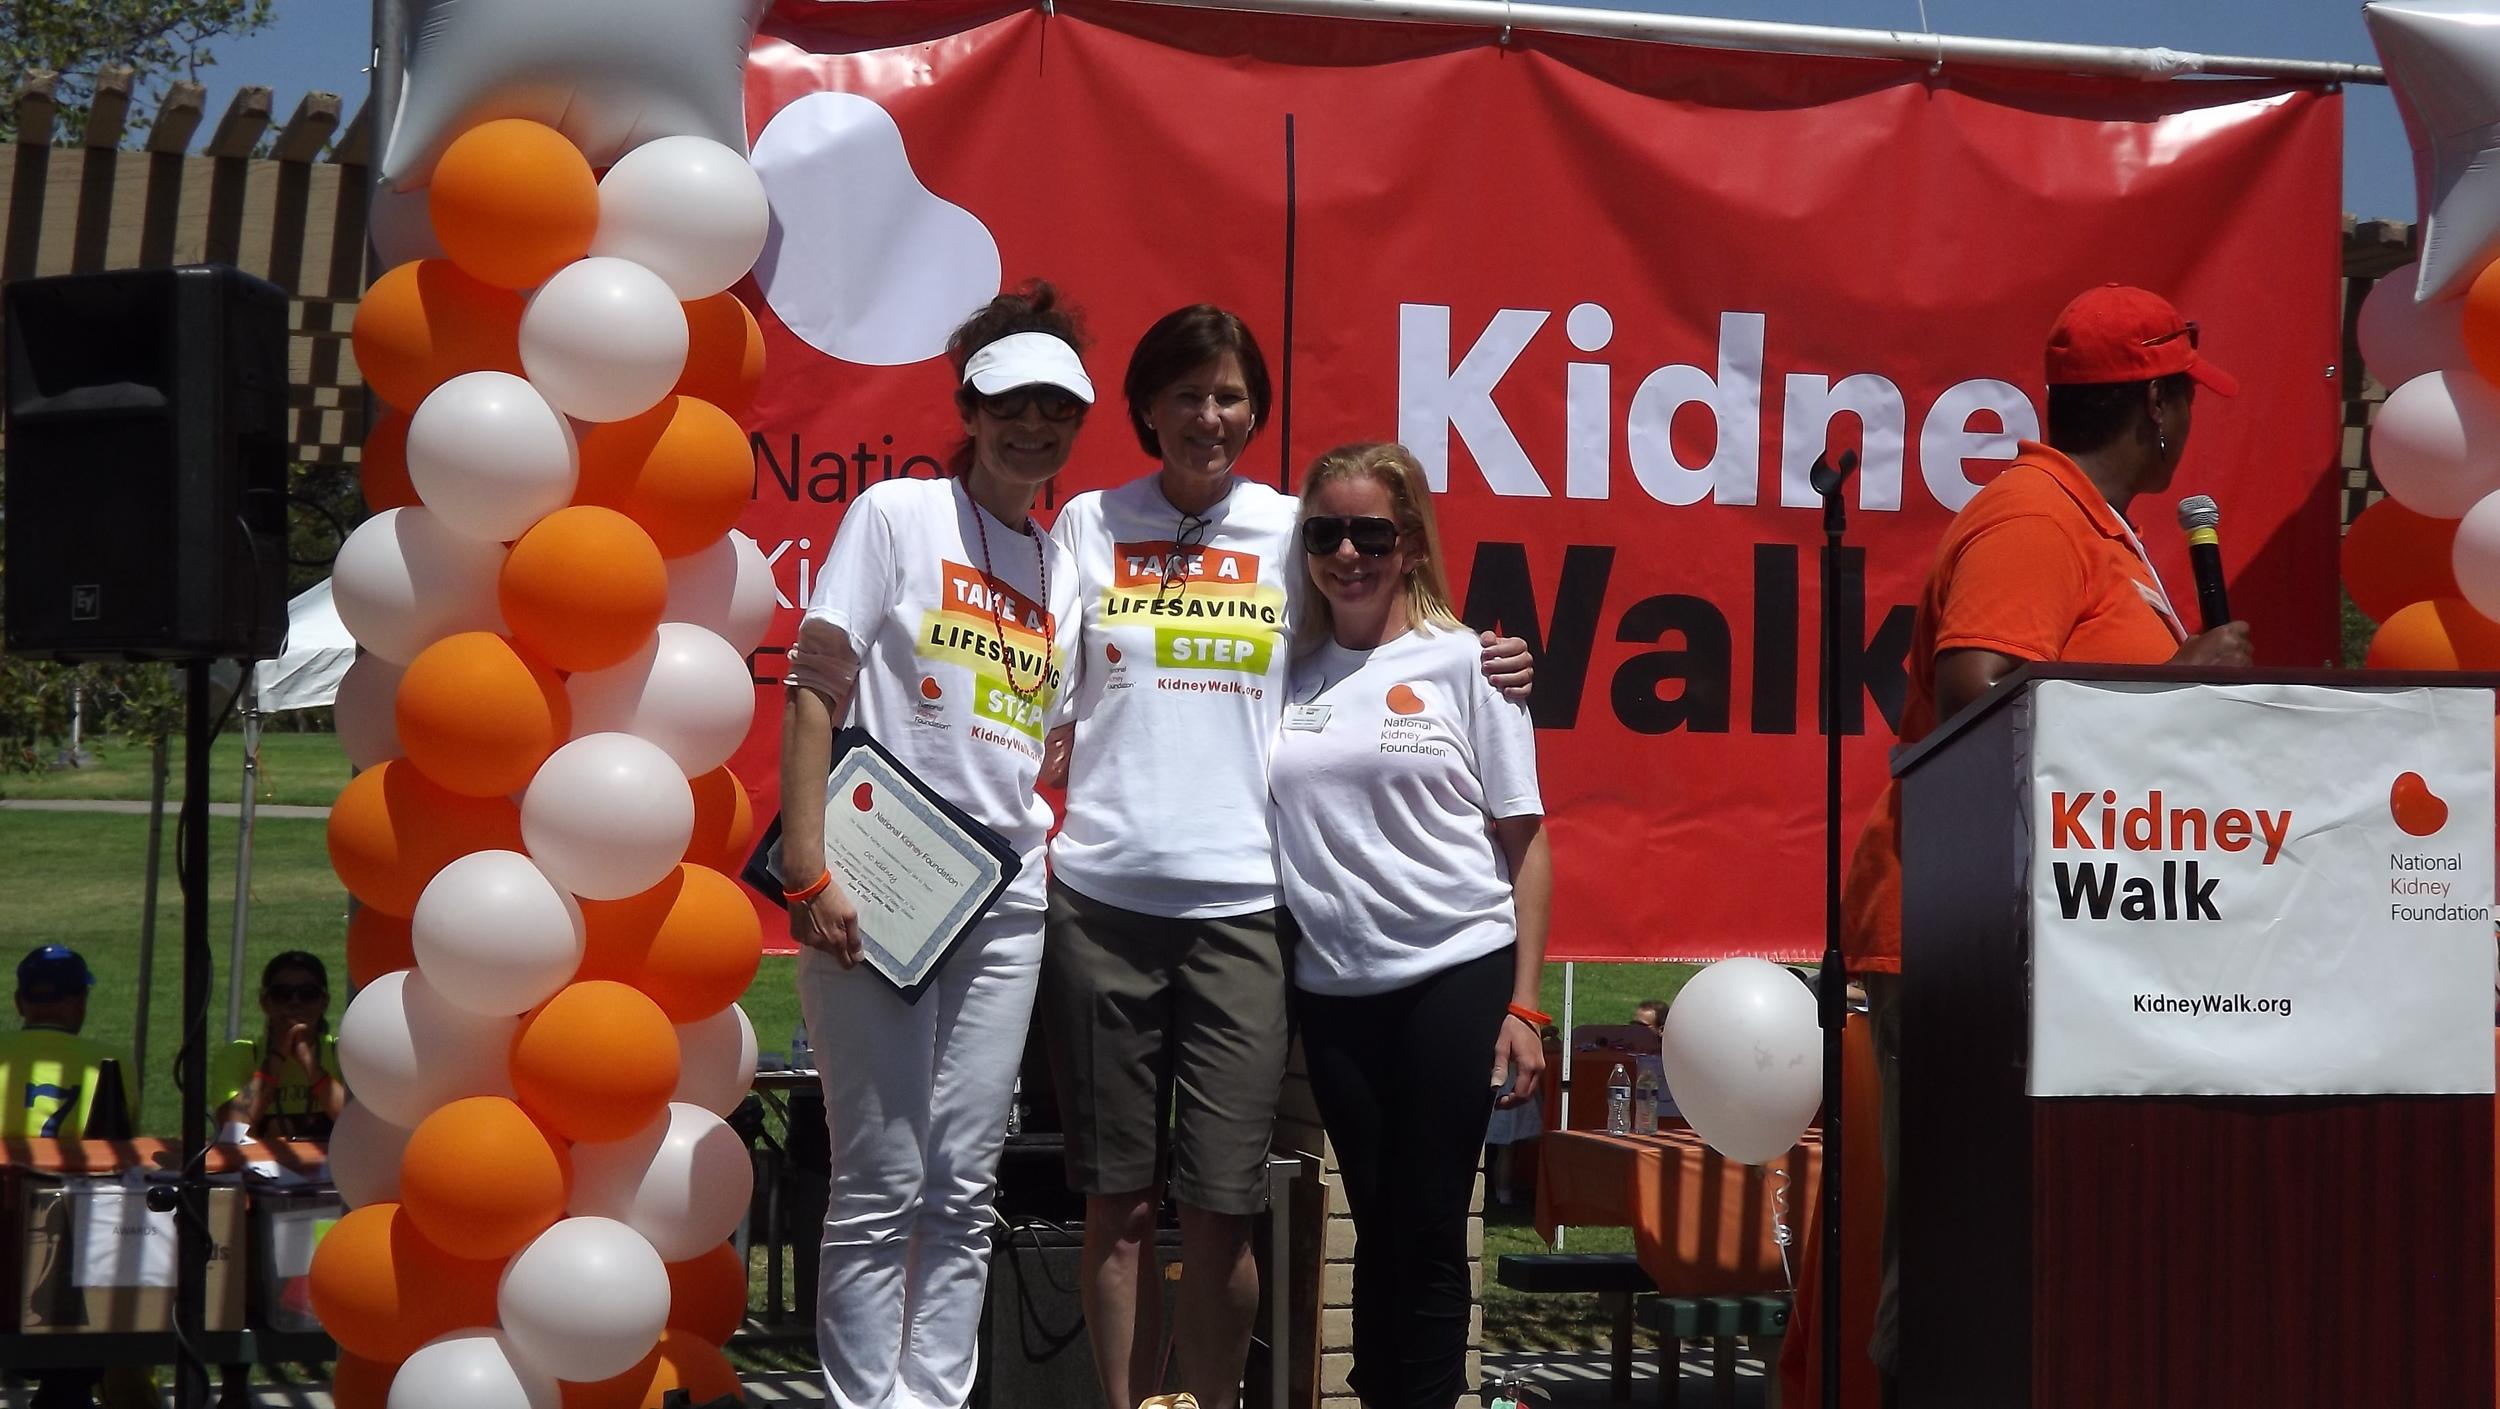 NKF Division President, Pier Merone with CA State Senator Mimi Walters & Alexandra Harrison